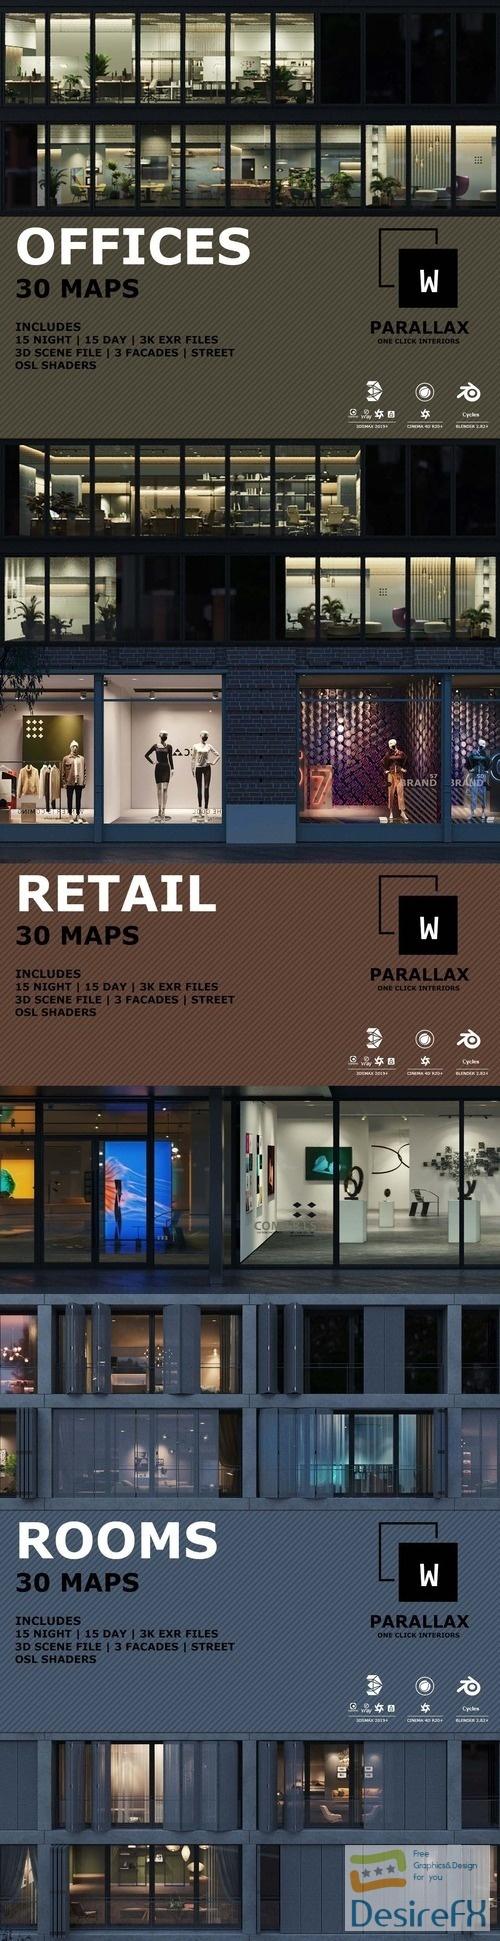 wParallax Bundle Pack 3D Models